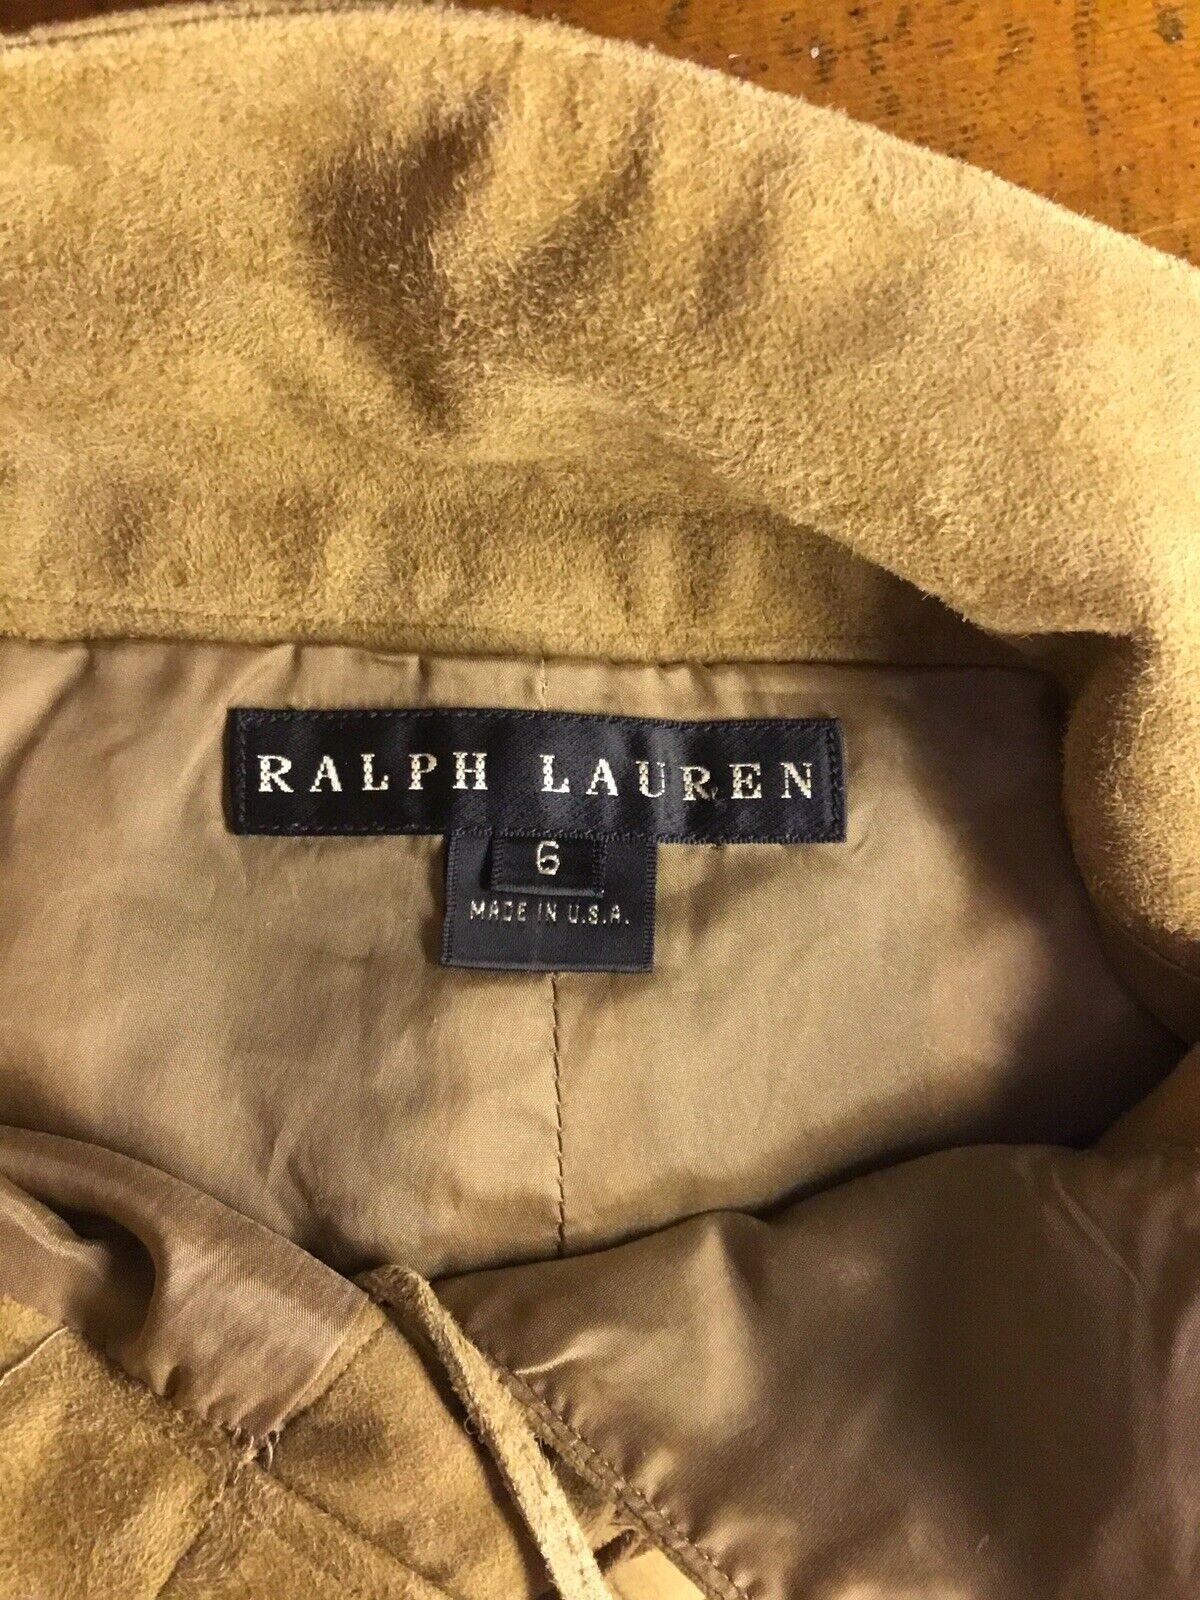 Ralph Lauren Black Label Gold Painted Brown Suede… - image 4